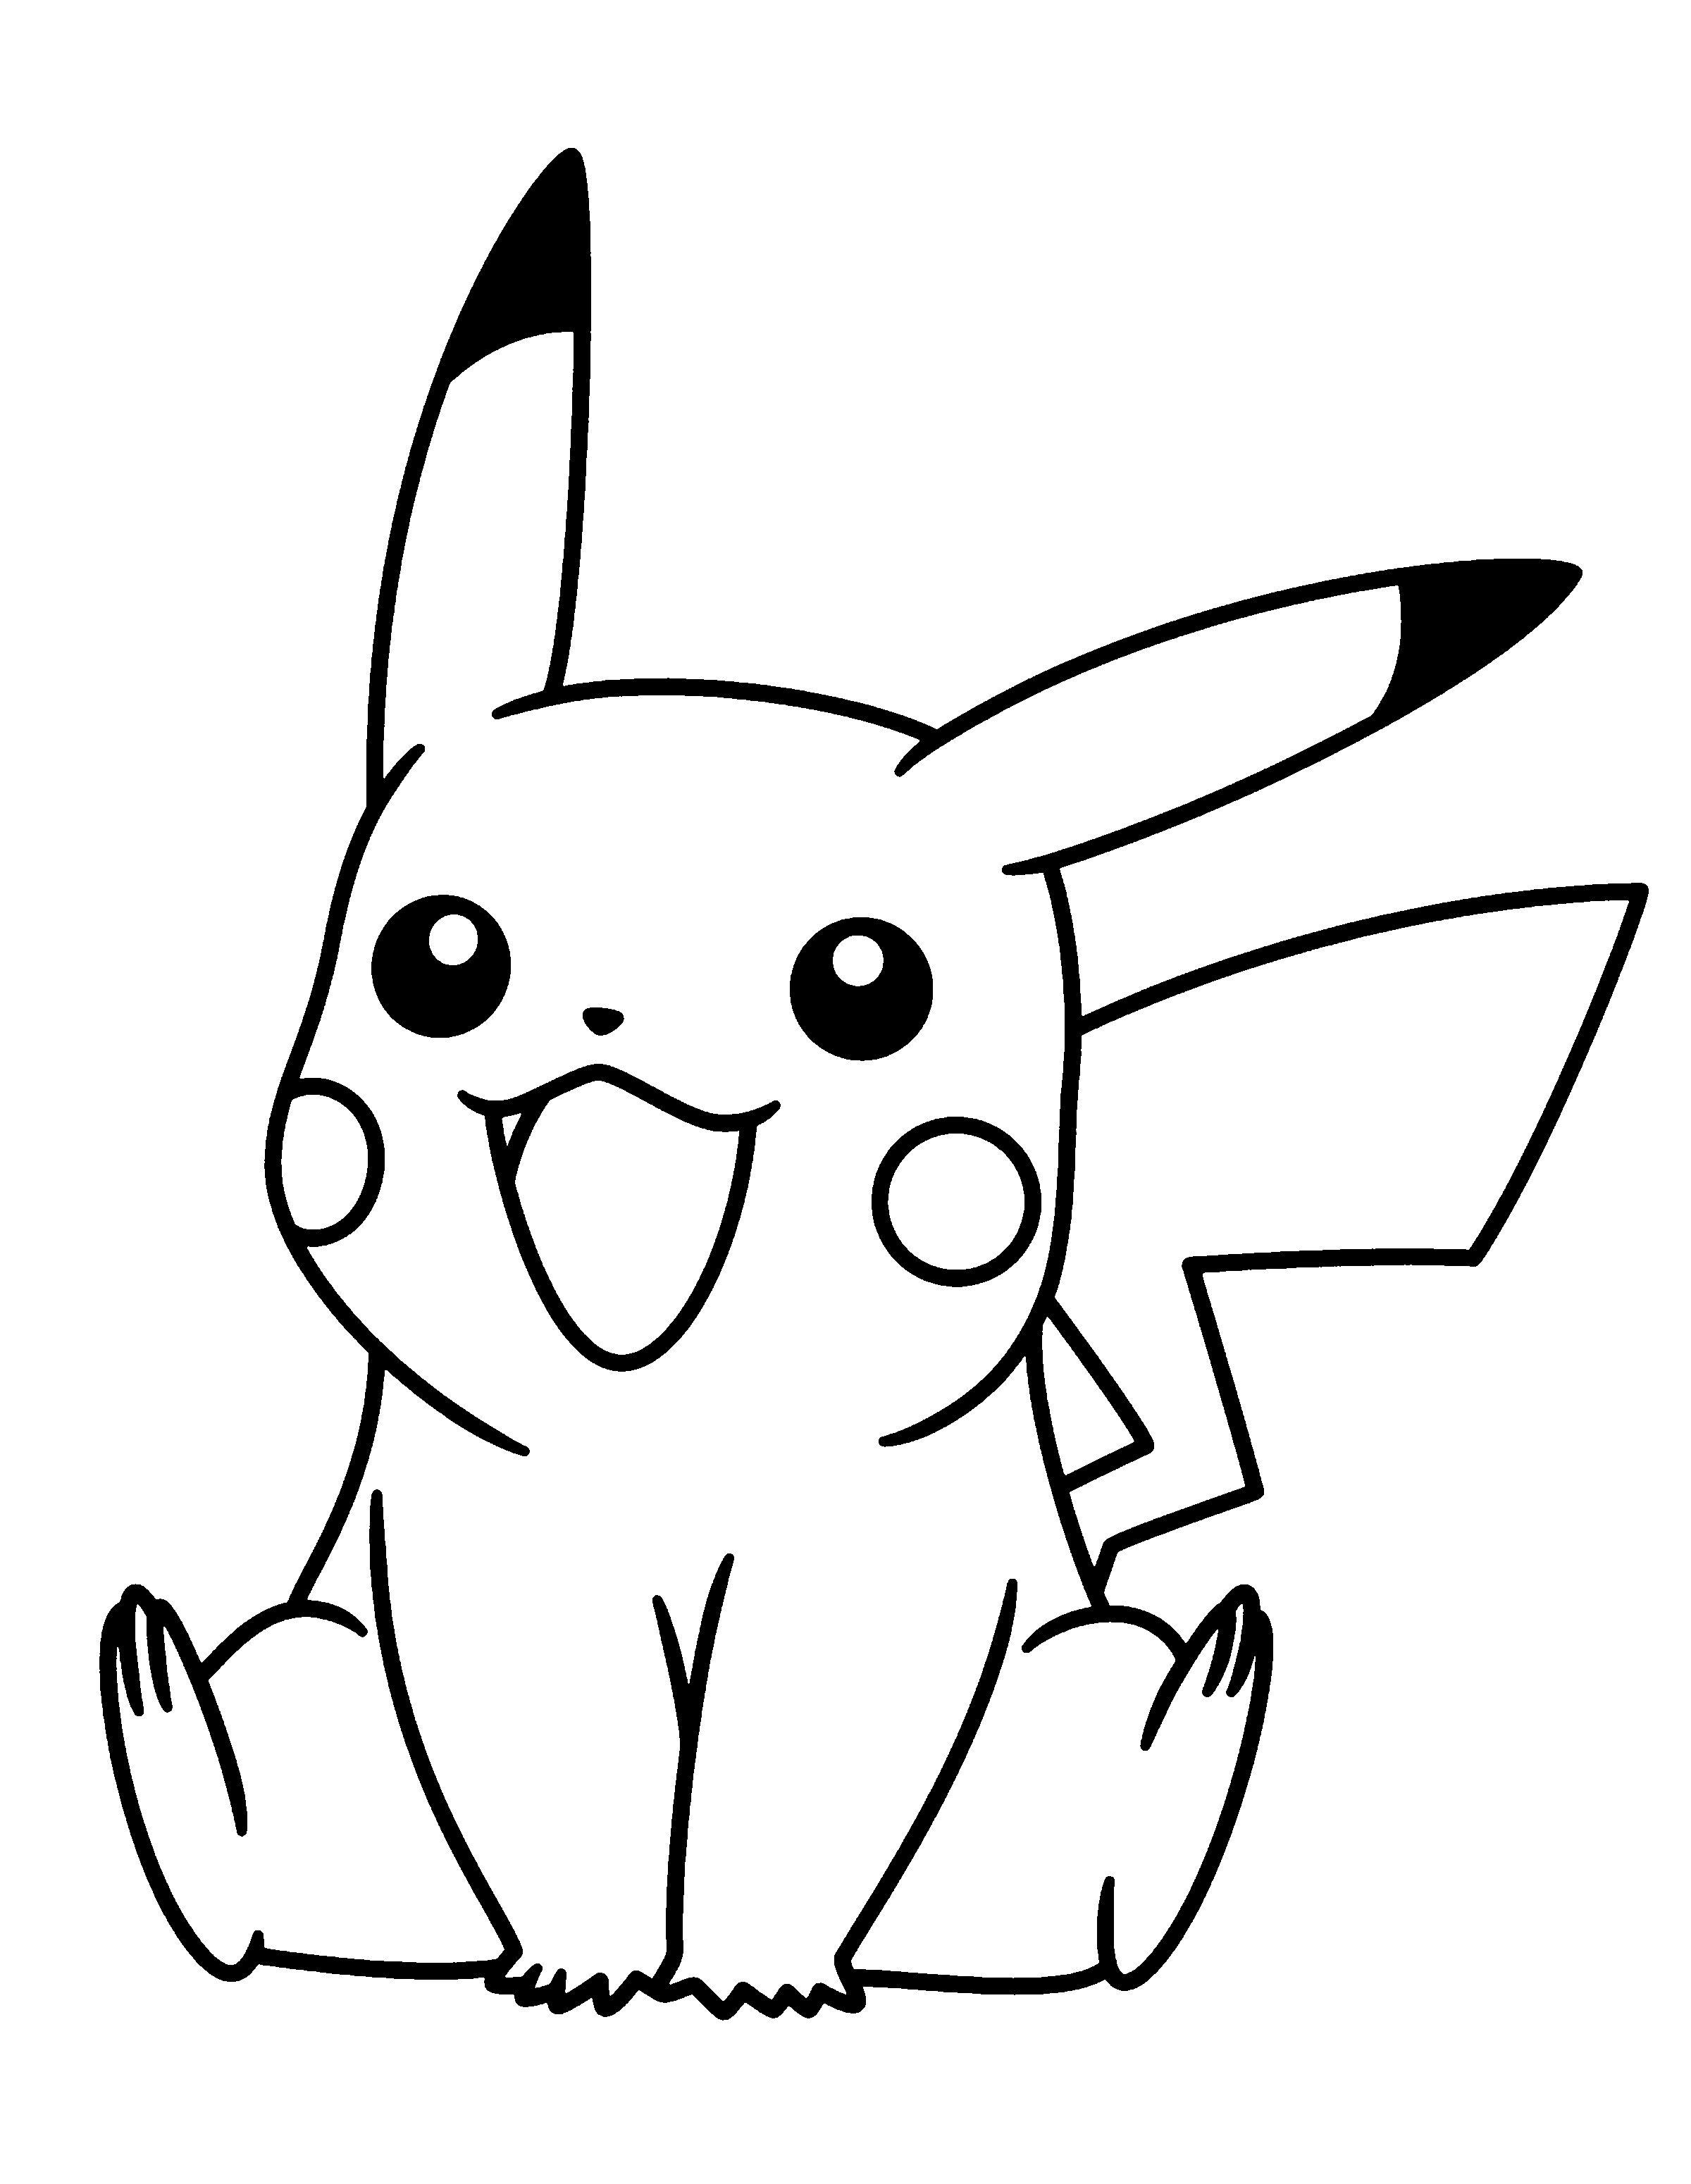 2400x3100 Free Pokemon Coloring Pages Dikma Dikma Coloring Book Pokemon